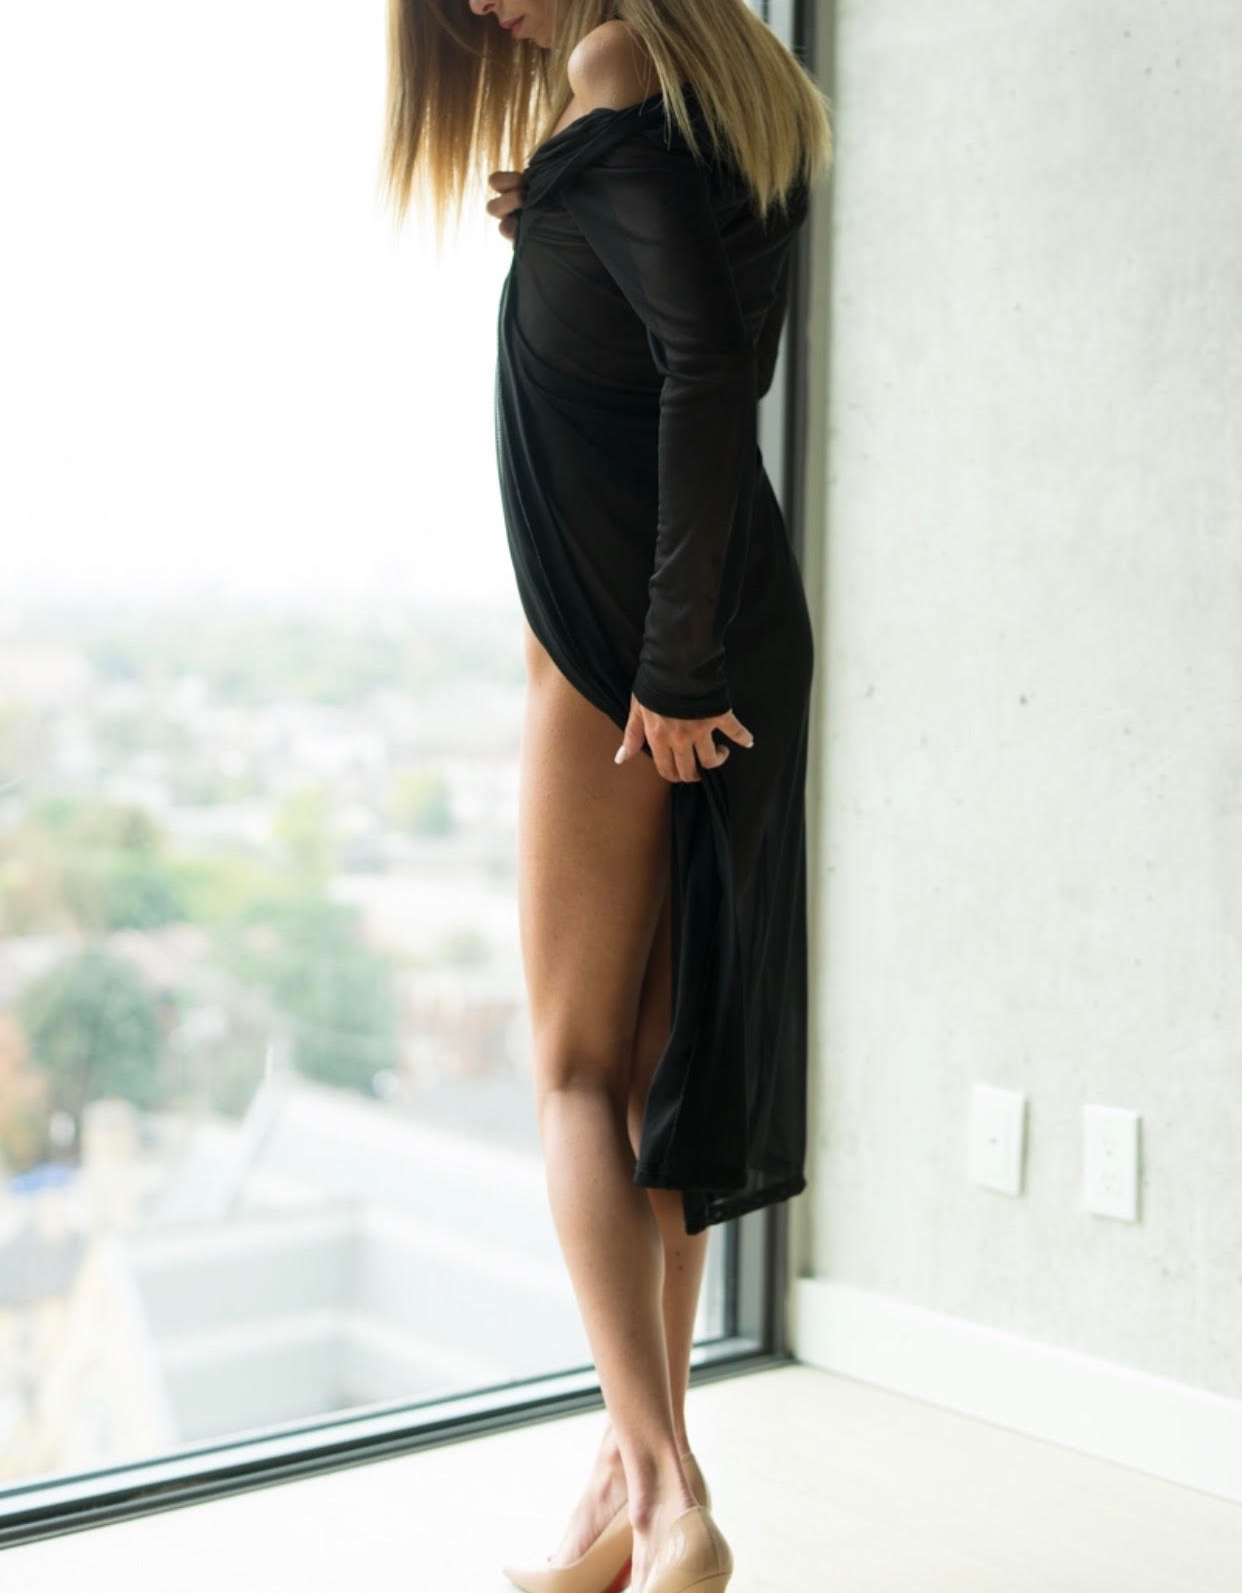 Model in lingerie - Alessia